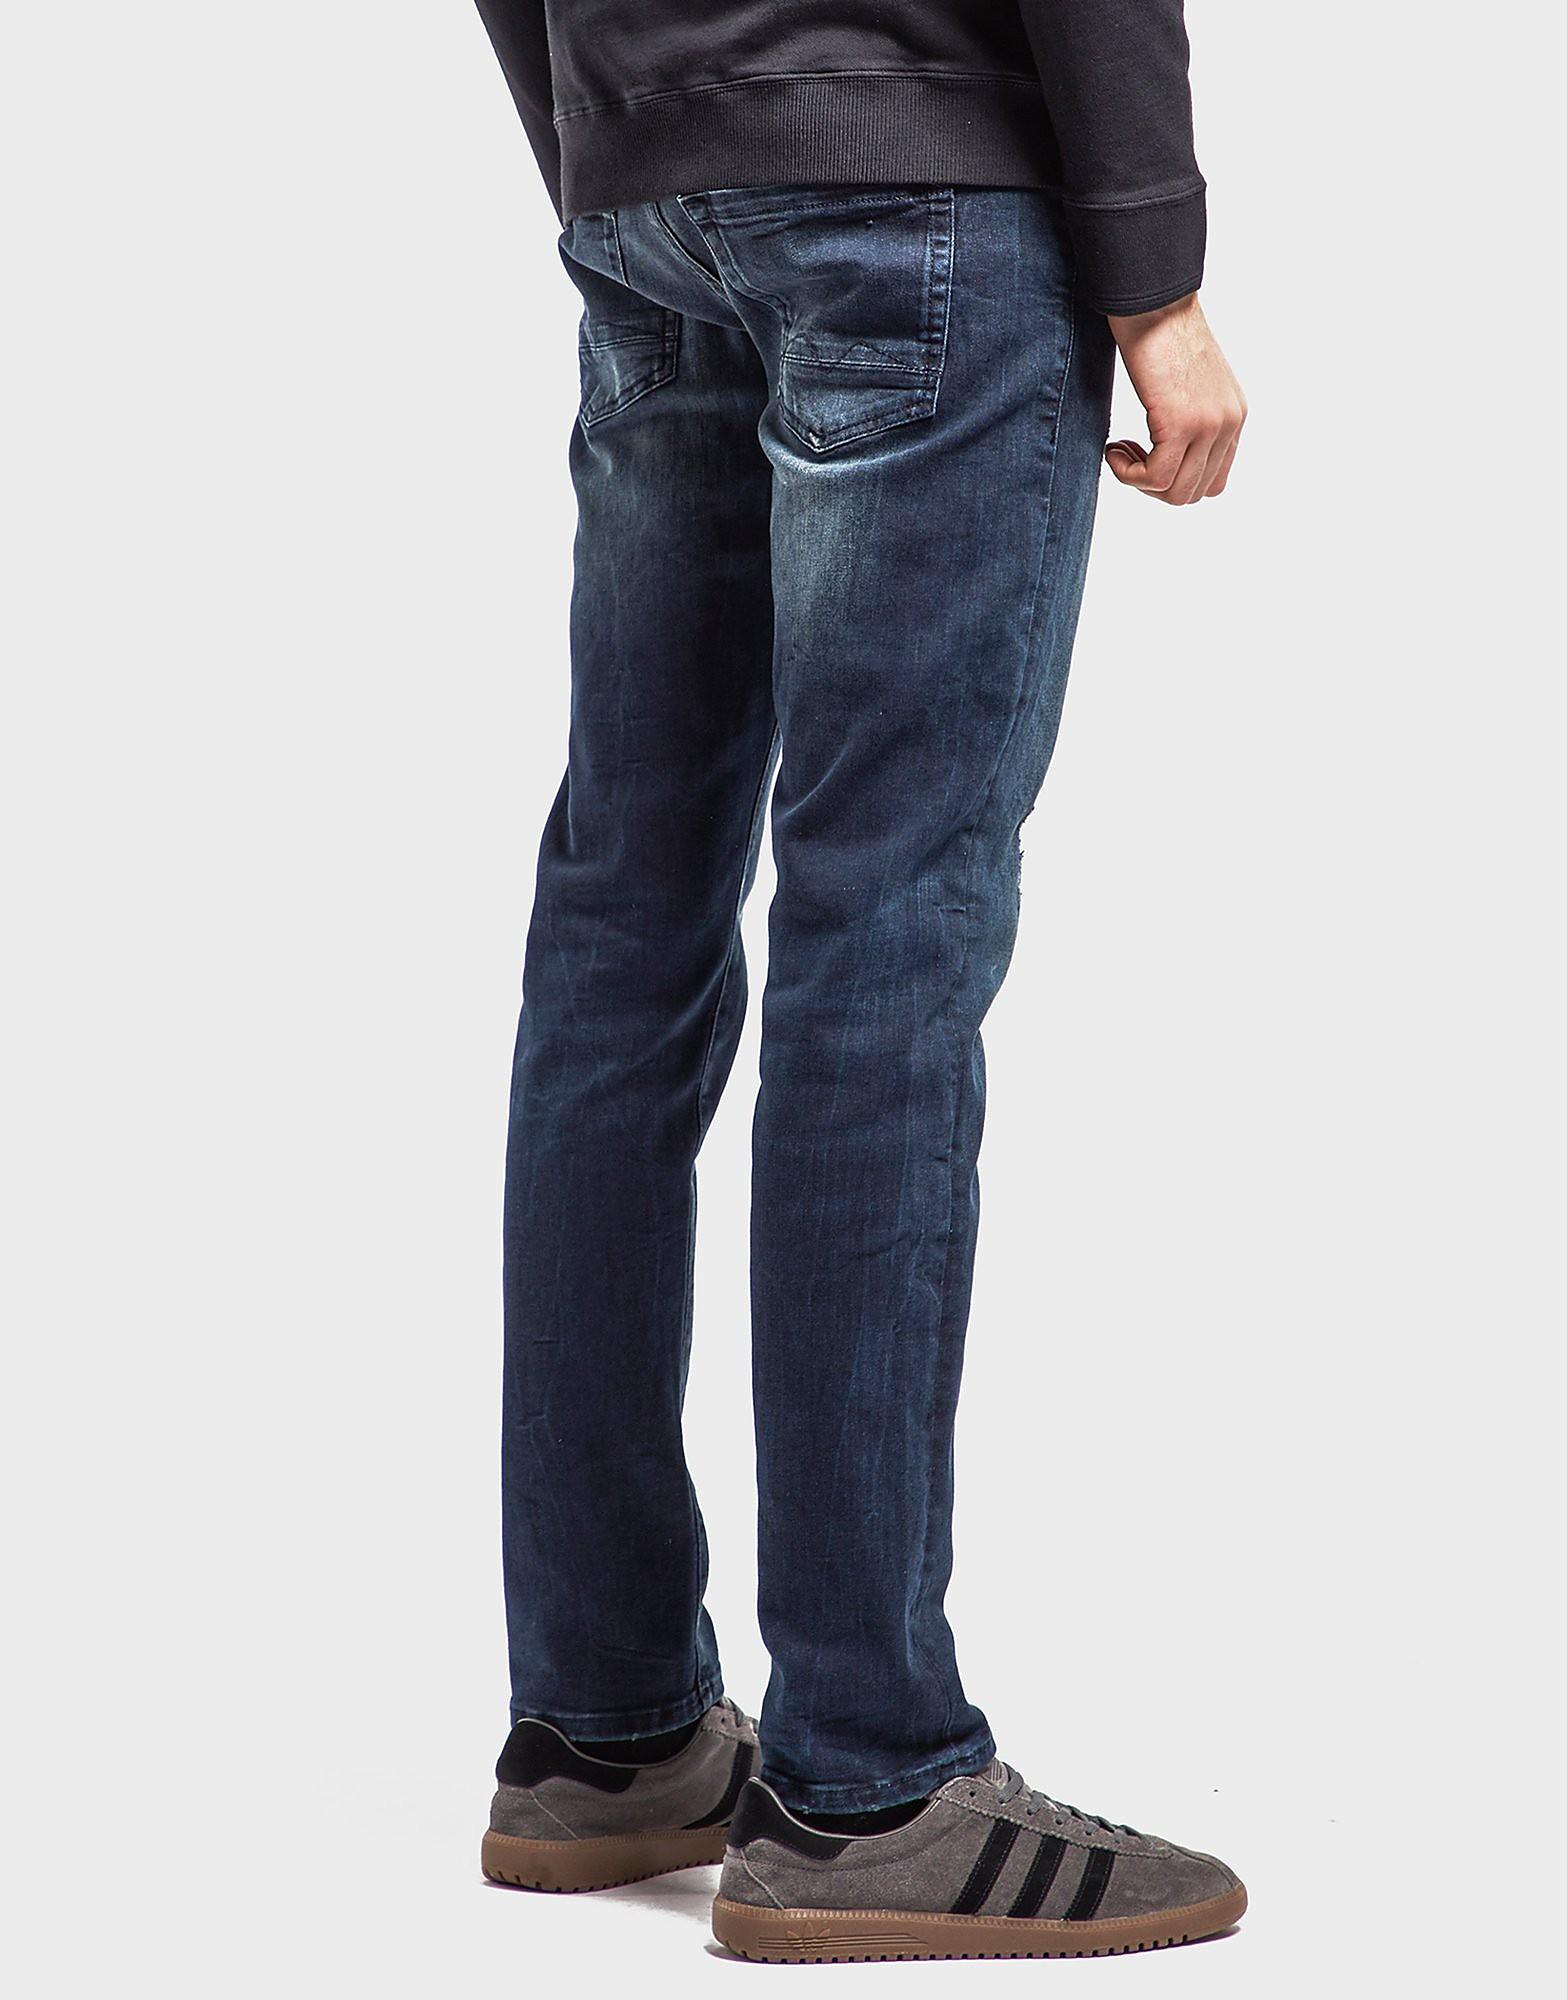 BOSS Orange 72 Compadre Stretch Skinny Jeans